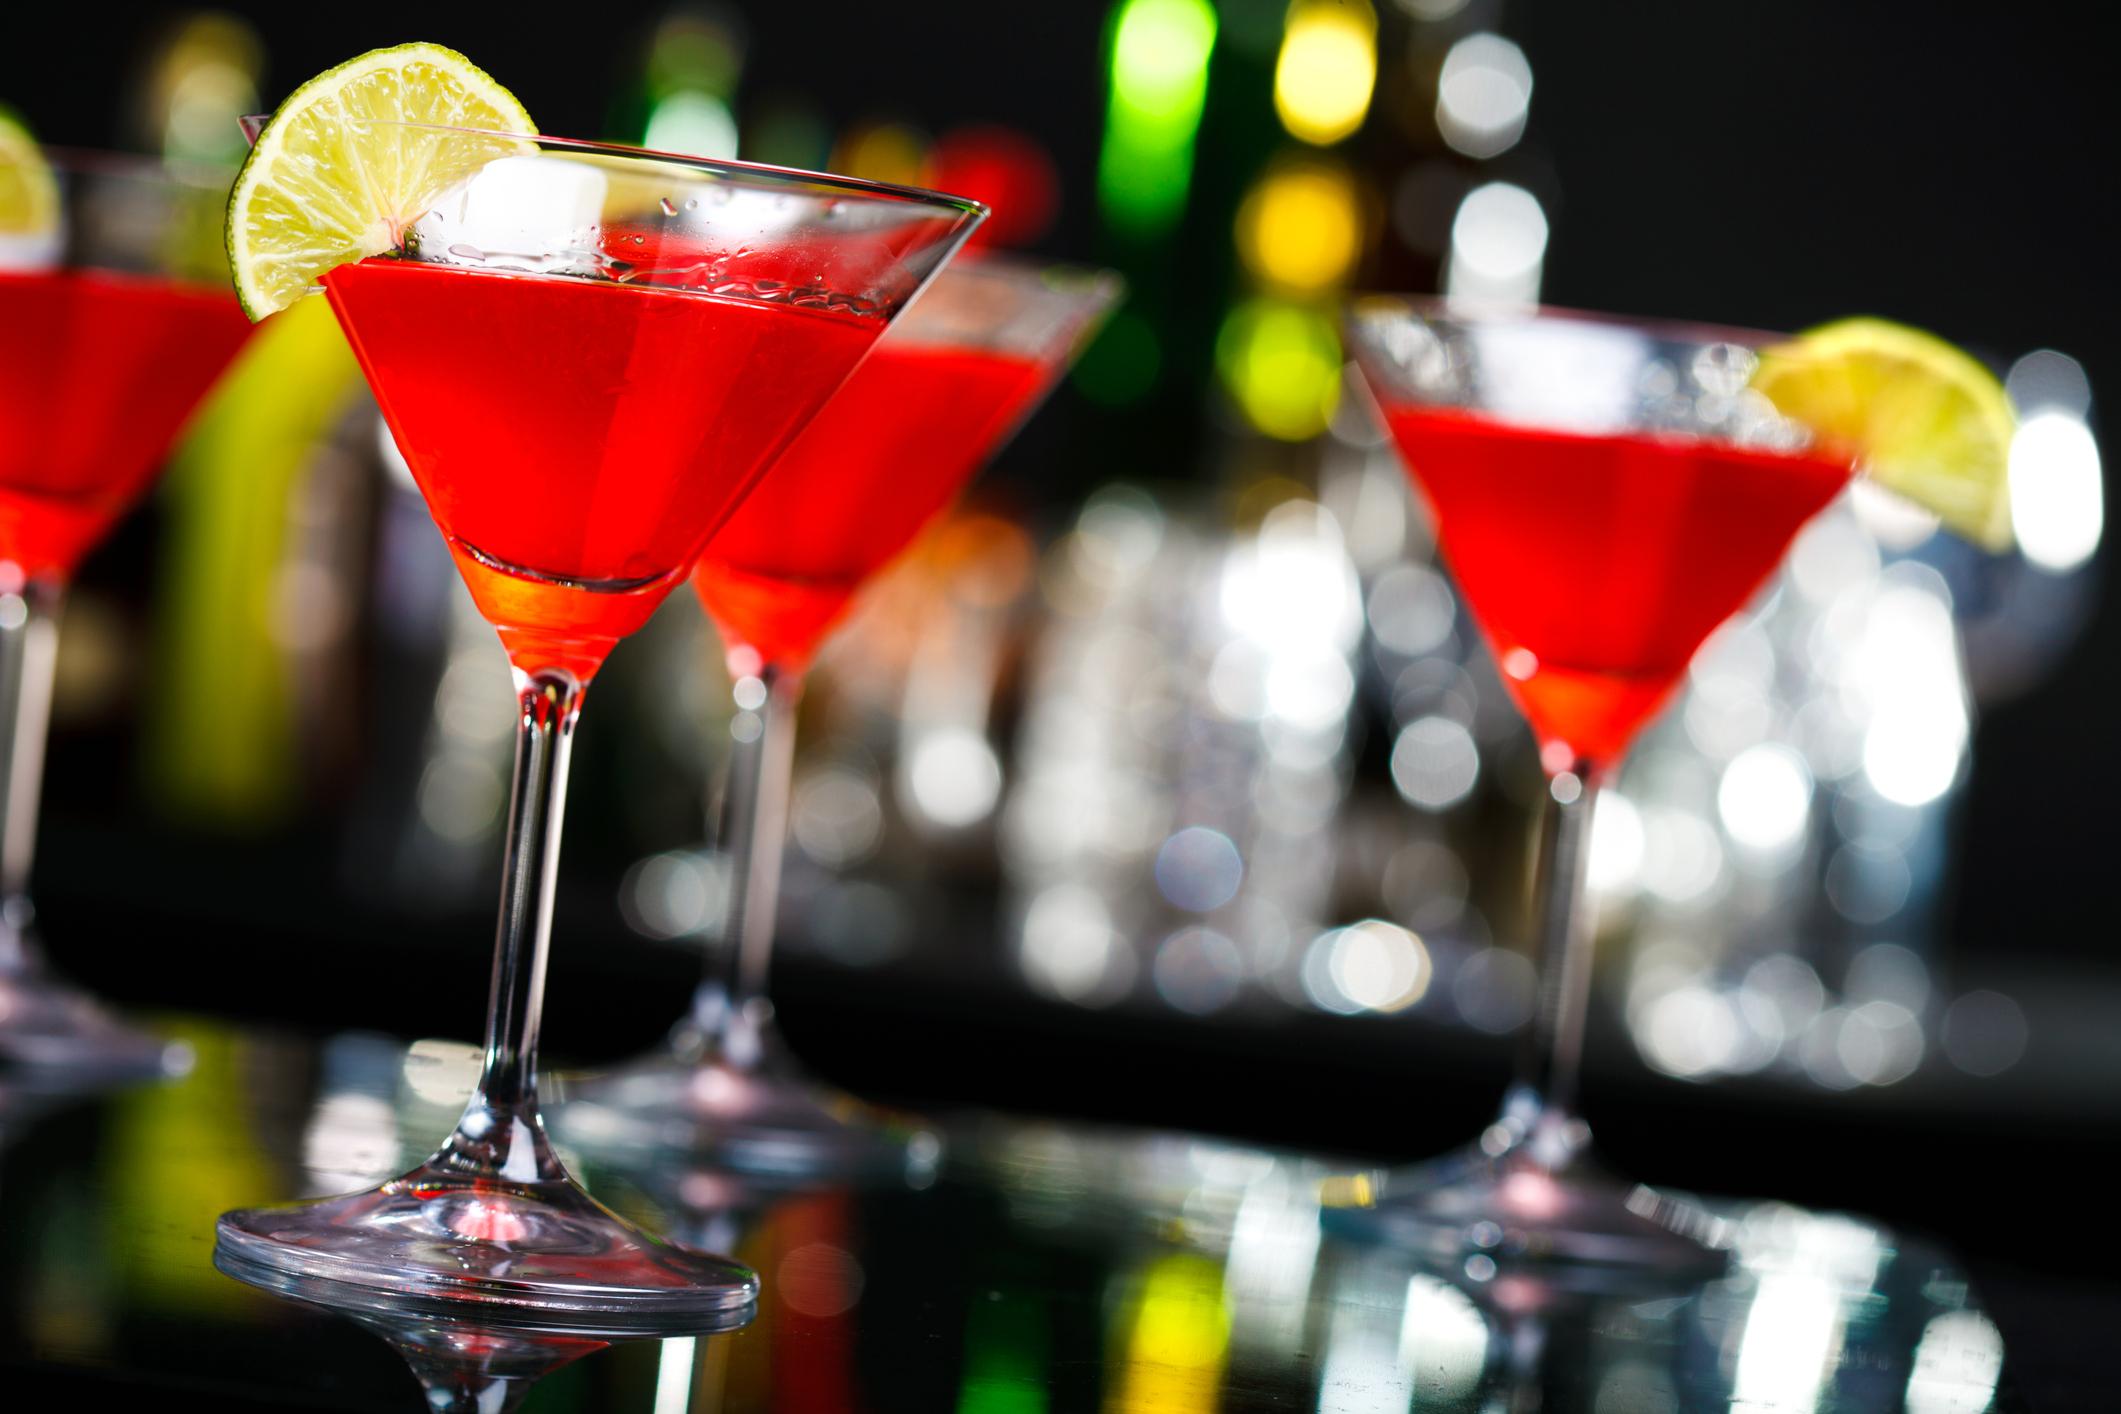 Cosmopolitan - Drinques tradicionais